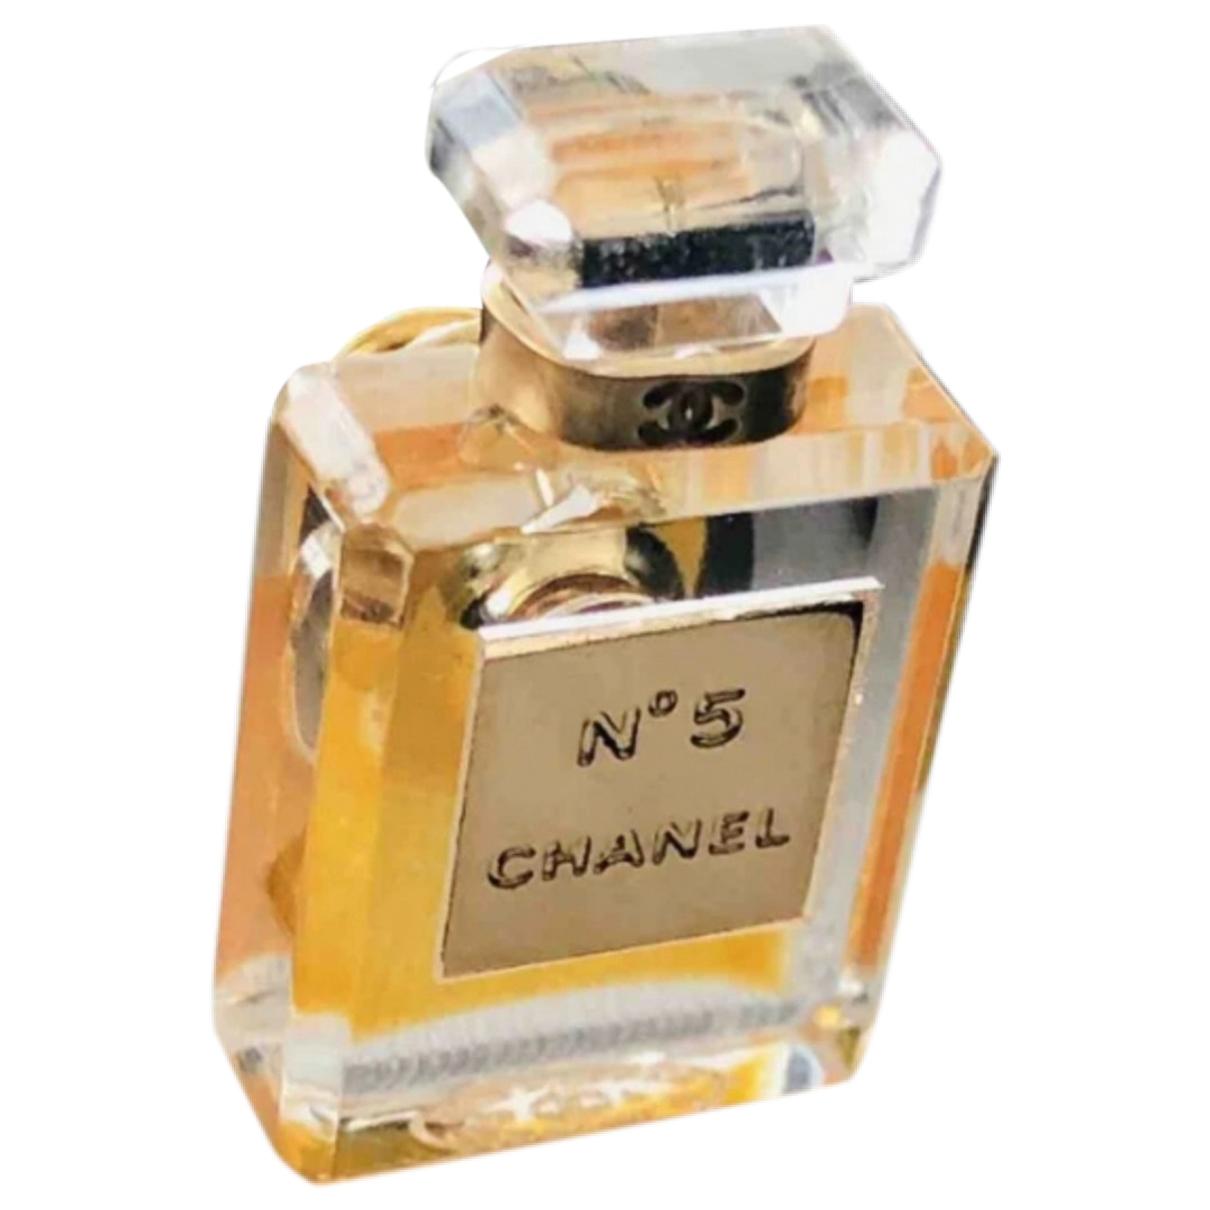 Chanel \N Brosche in  Gelb Kunststoff